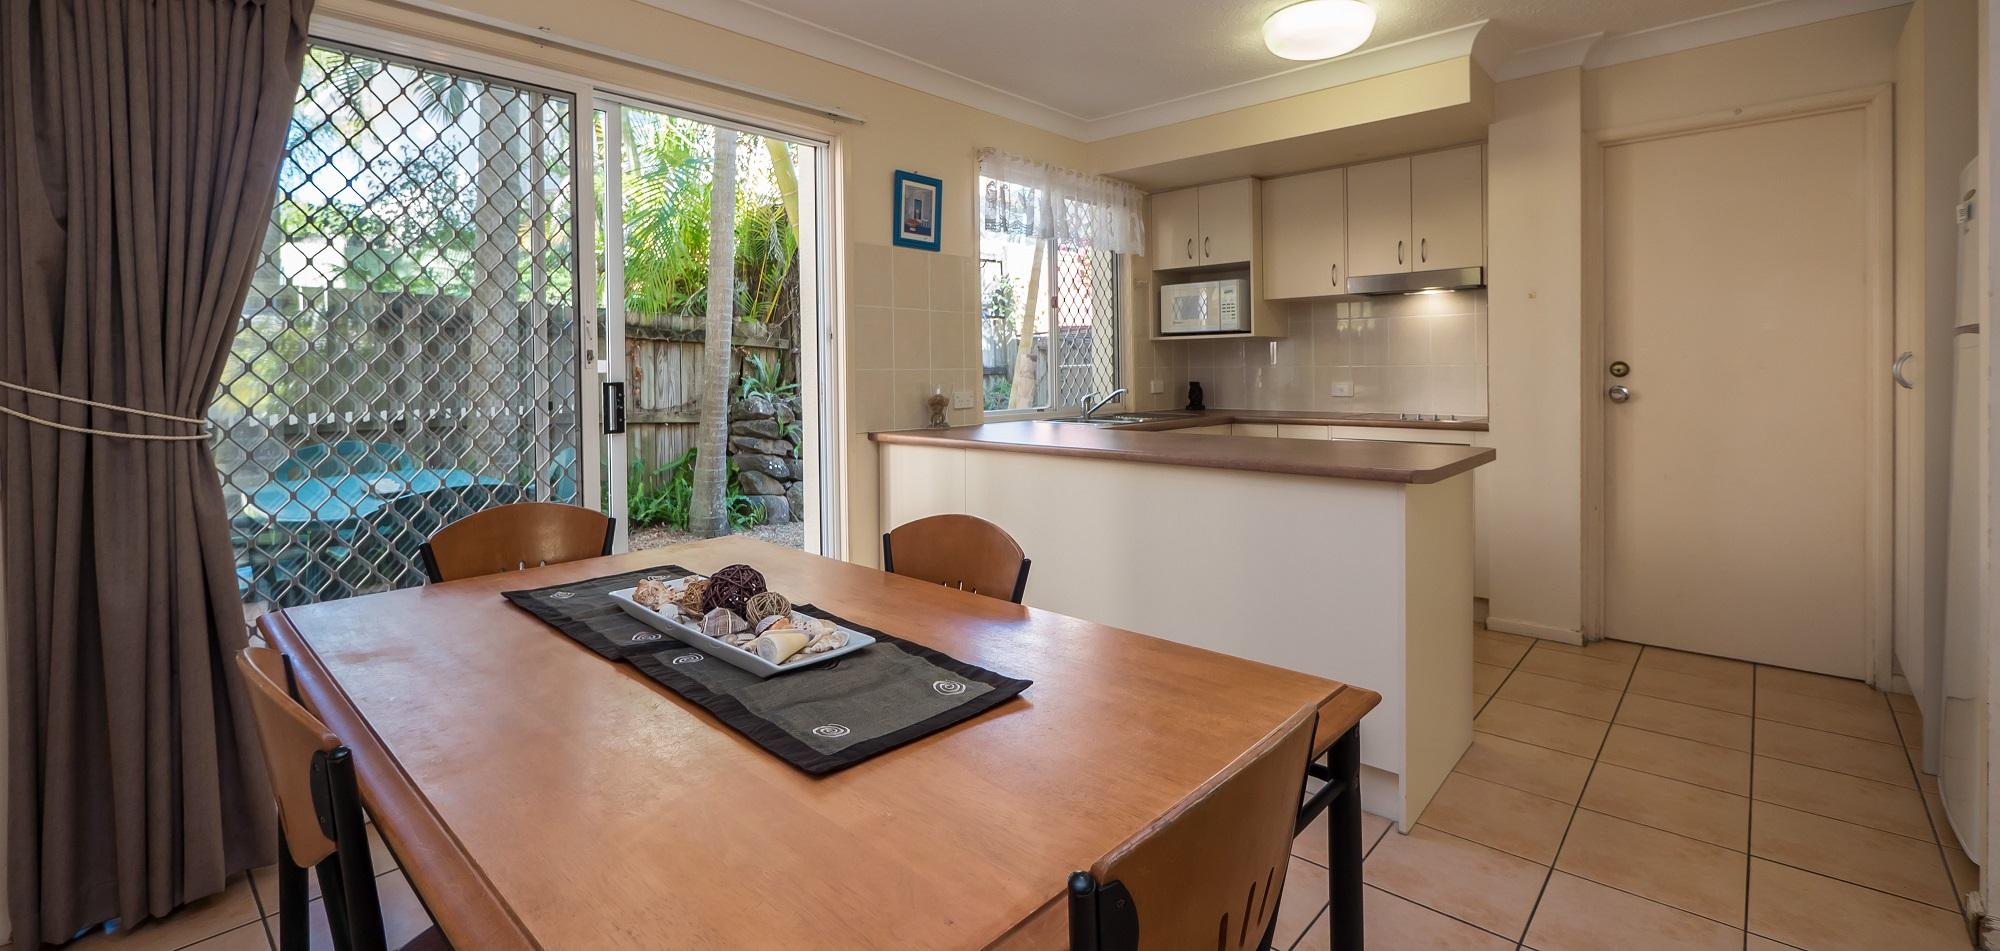 Isle of Palms Resort Accommodation - Dining and Kitchen